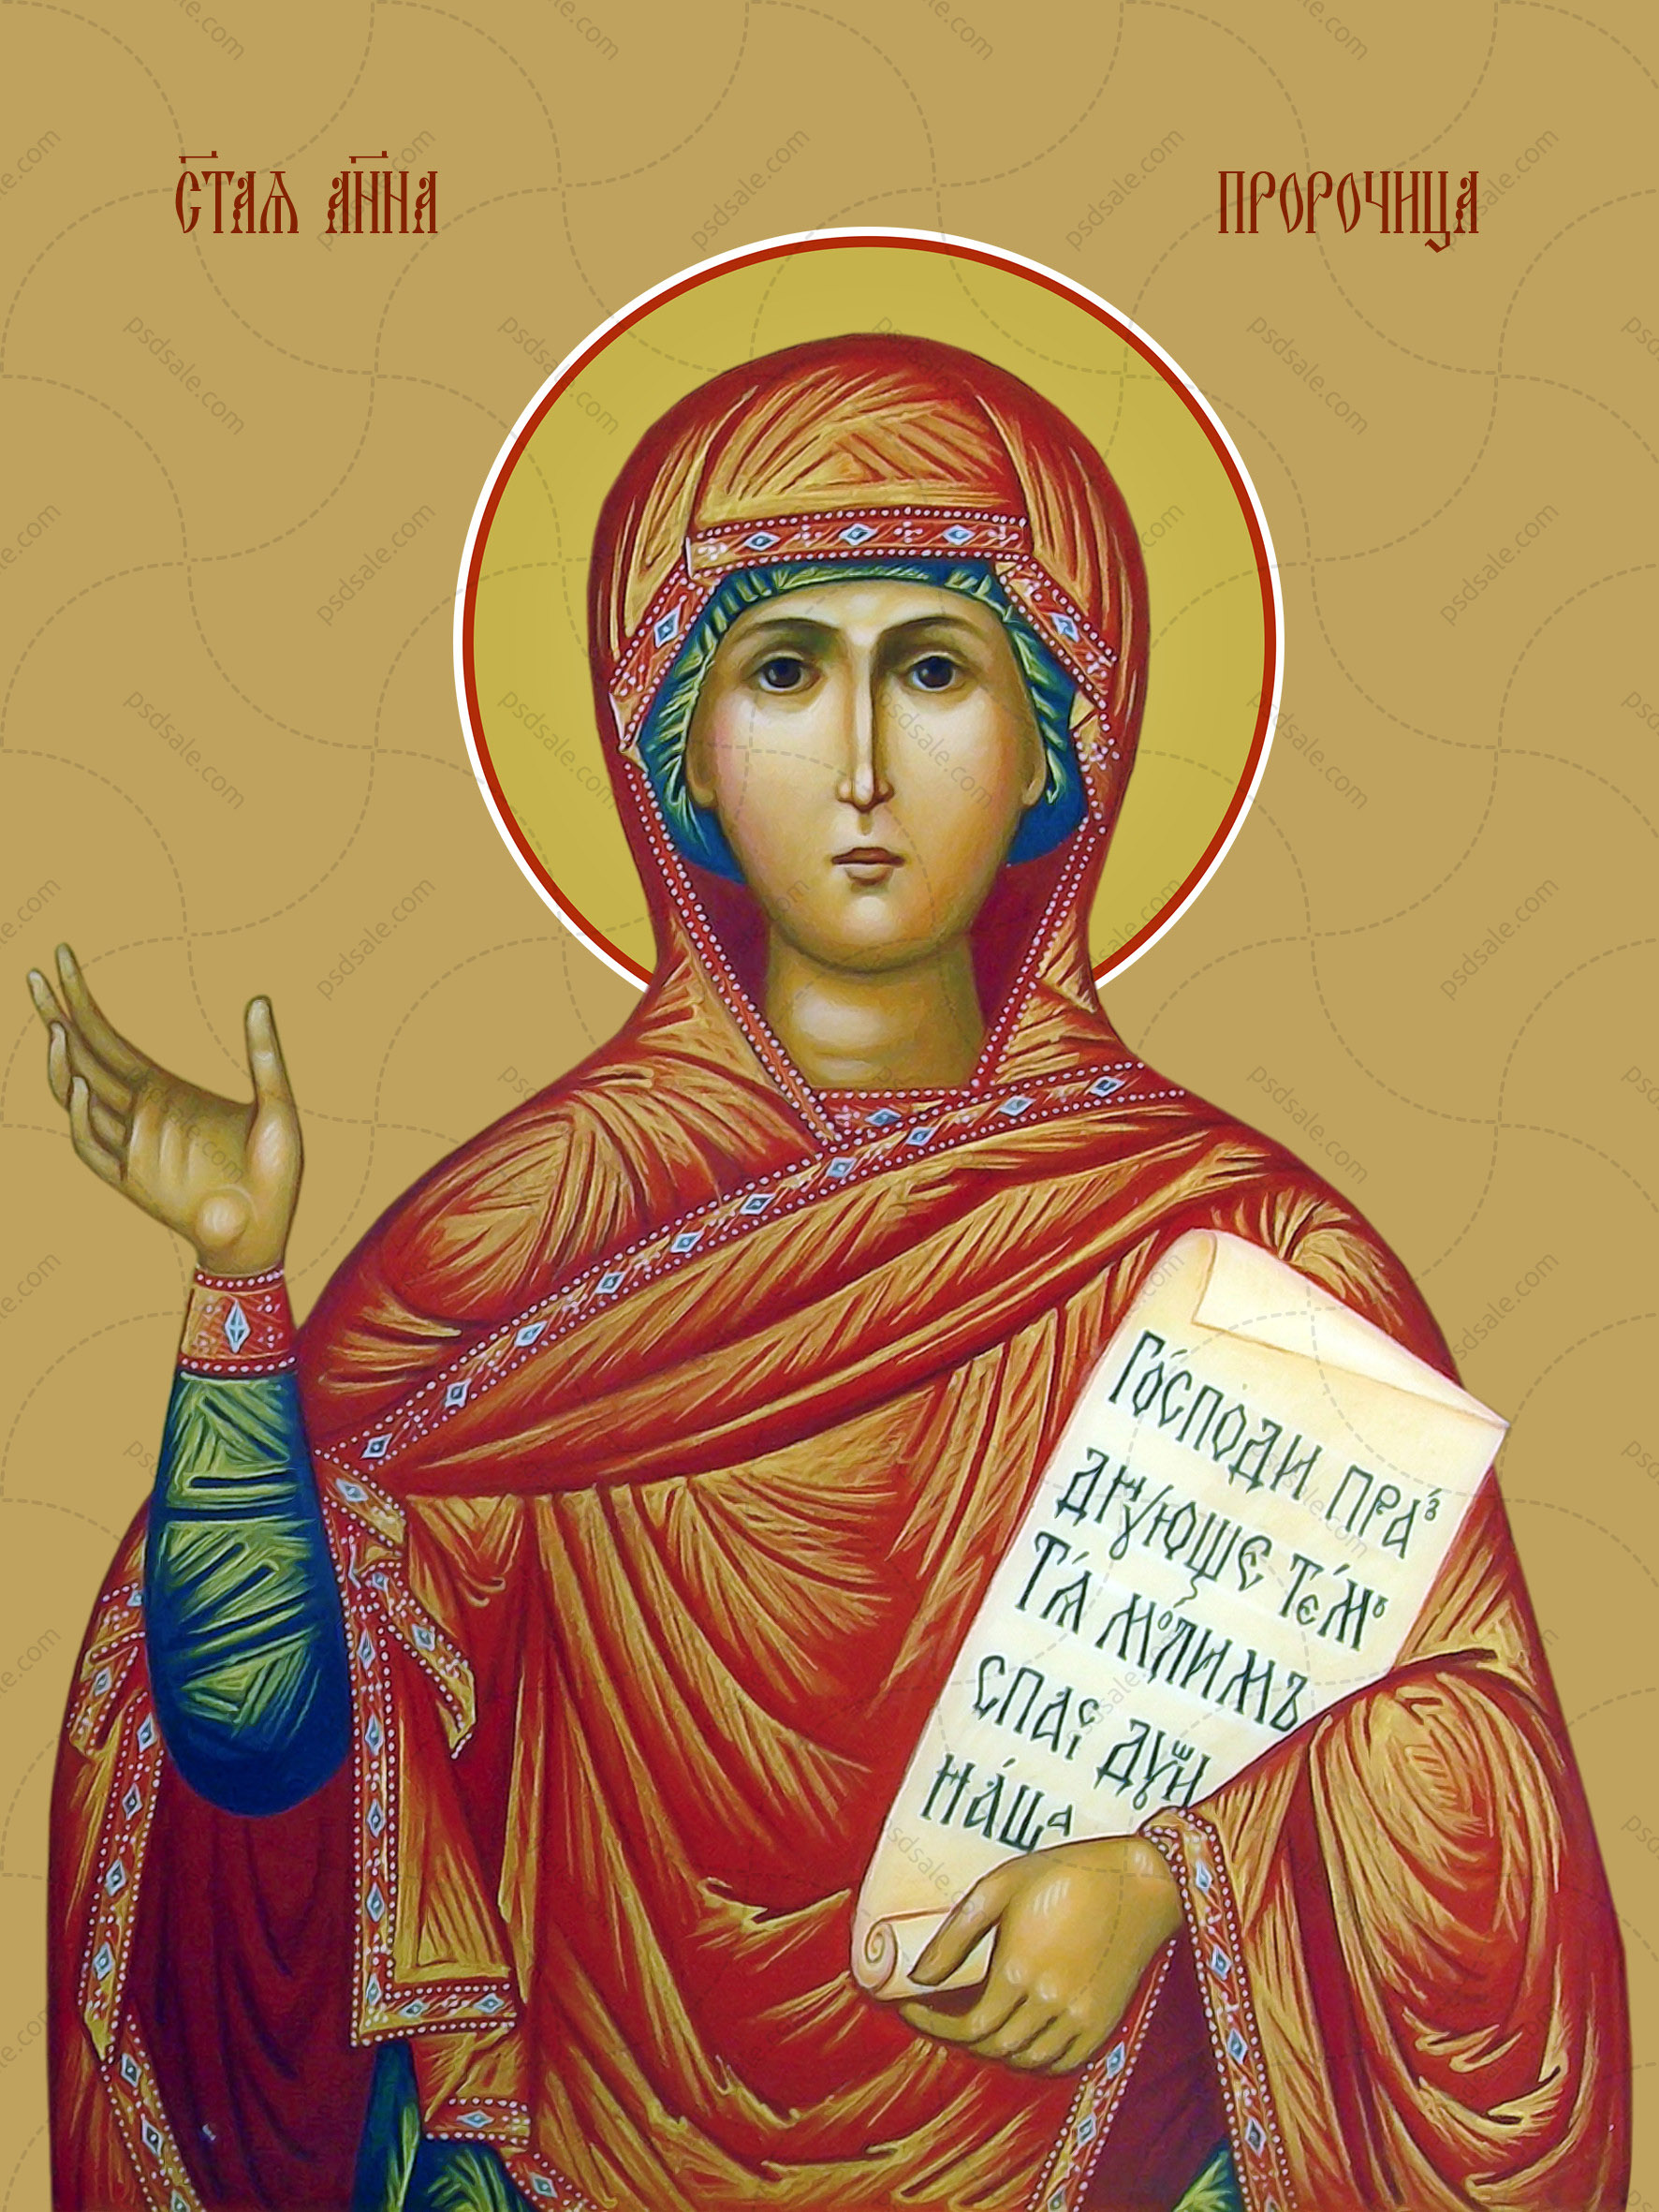 Анна Пророчица, святая